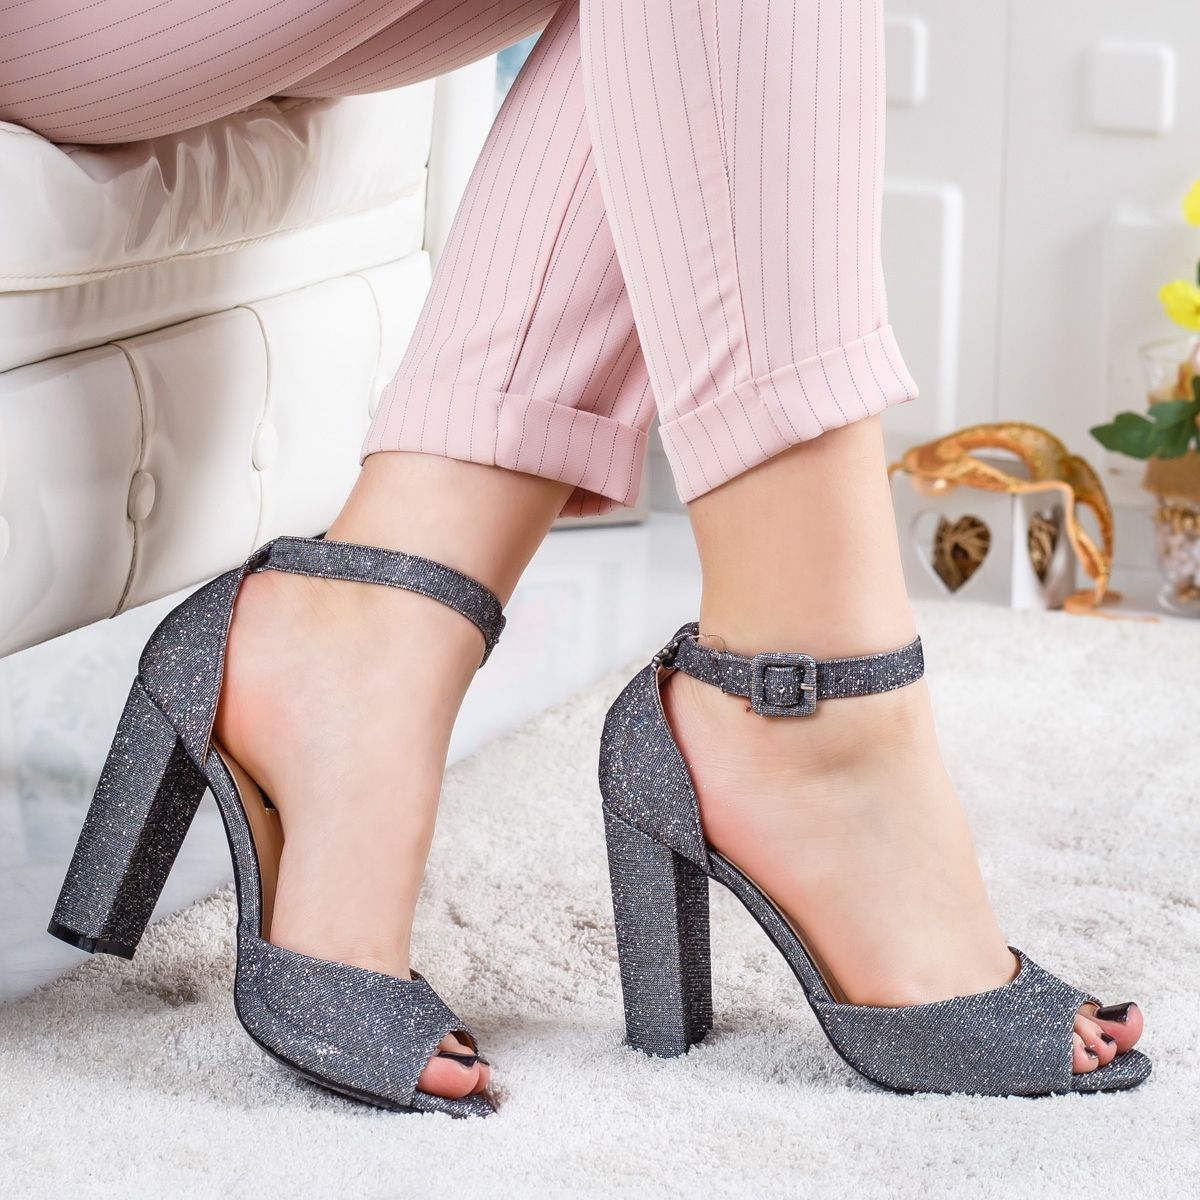 Sandale Dama Paritali Gri Elegante Fashion Heels Shoes